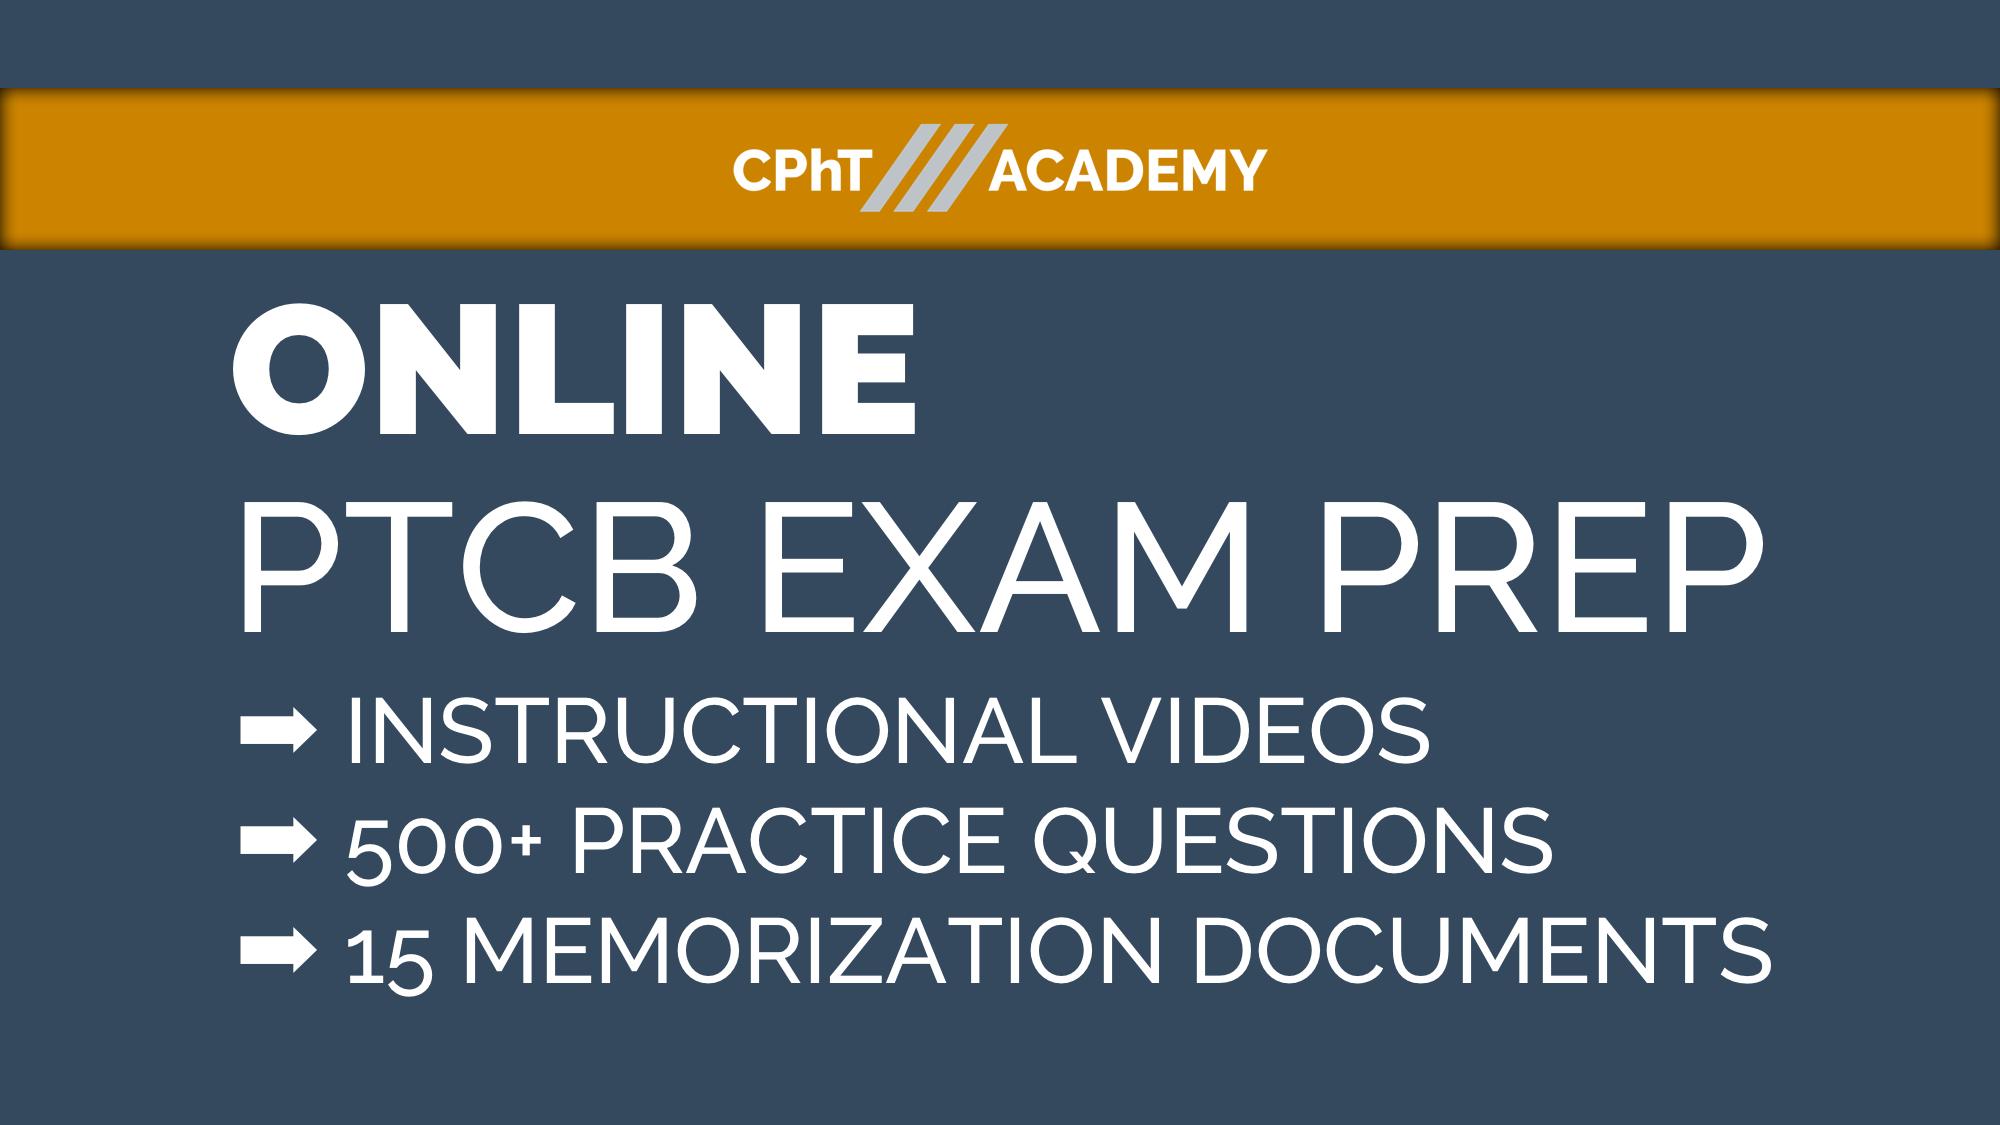 Ptcb excpt exam prep cpht academy malvernweather Choice Image